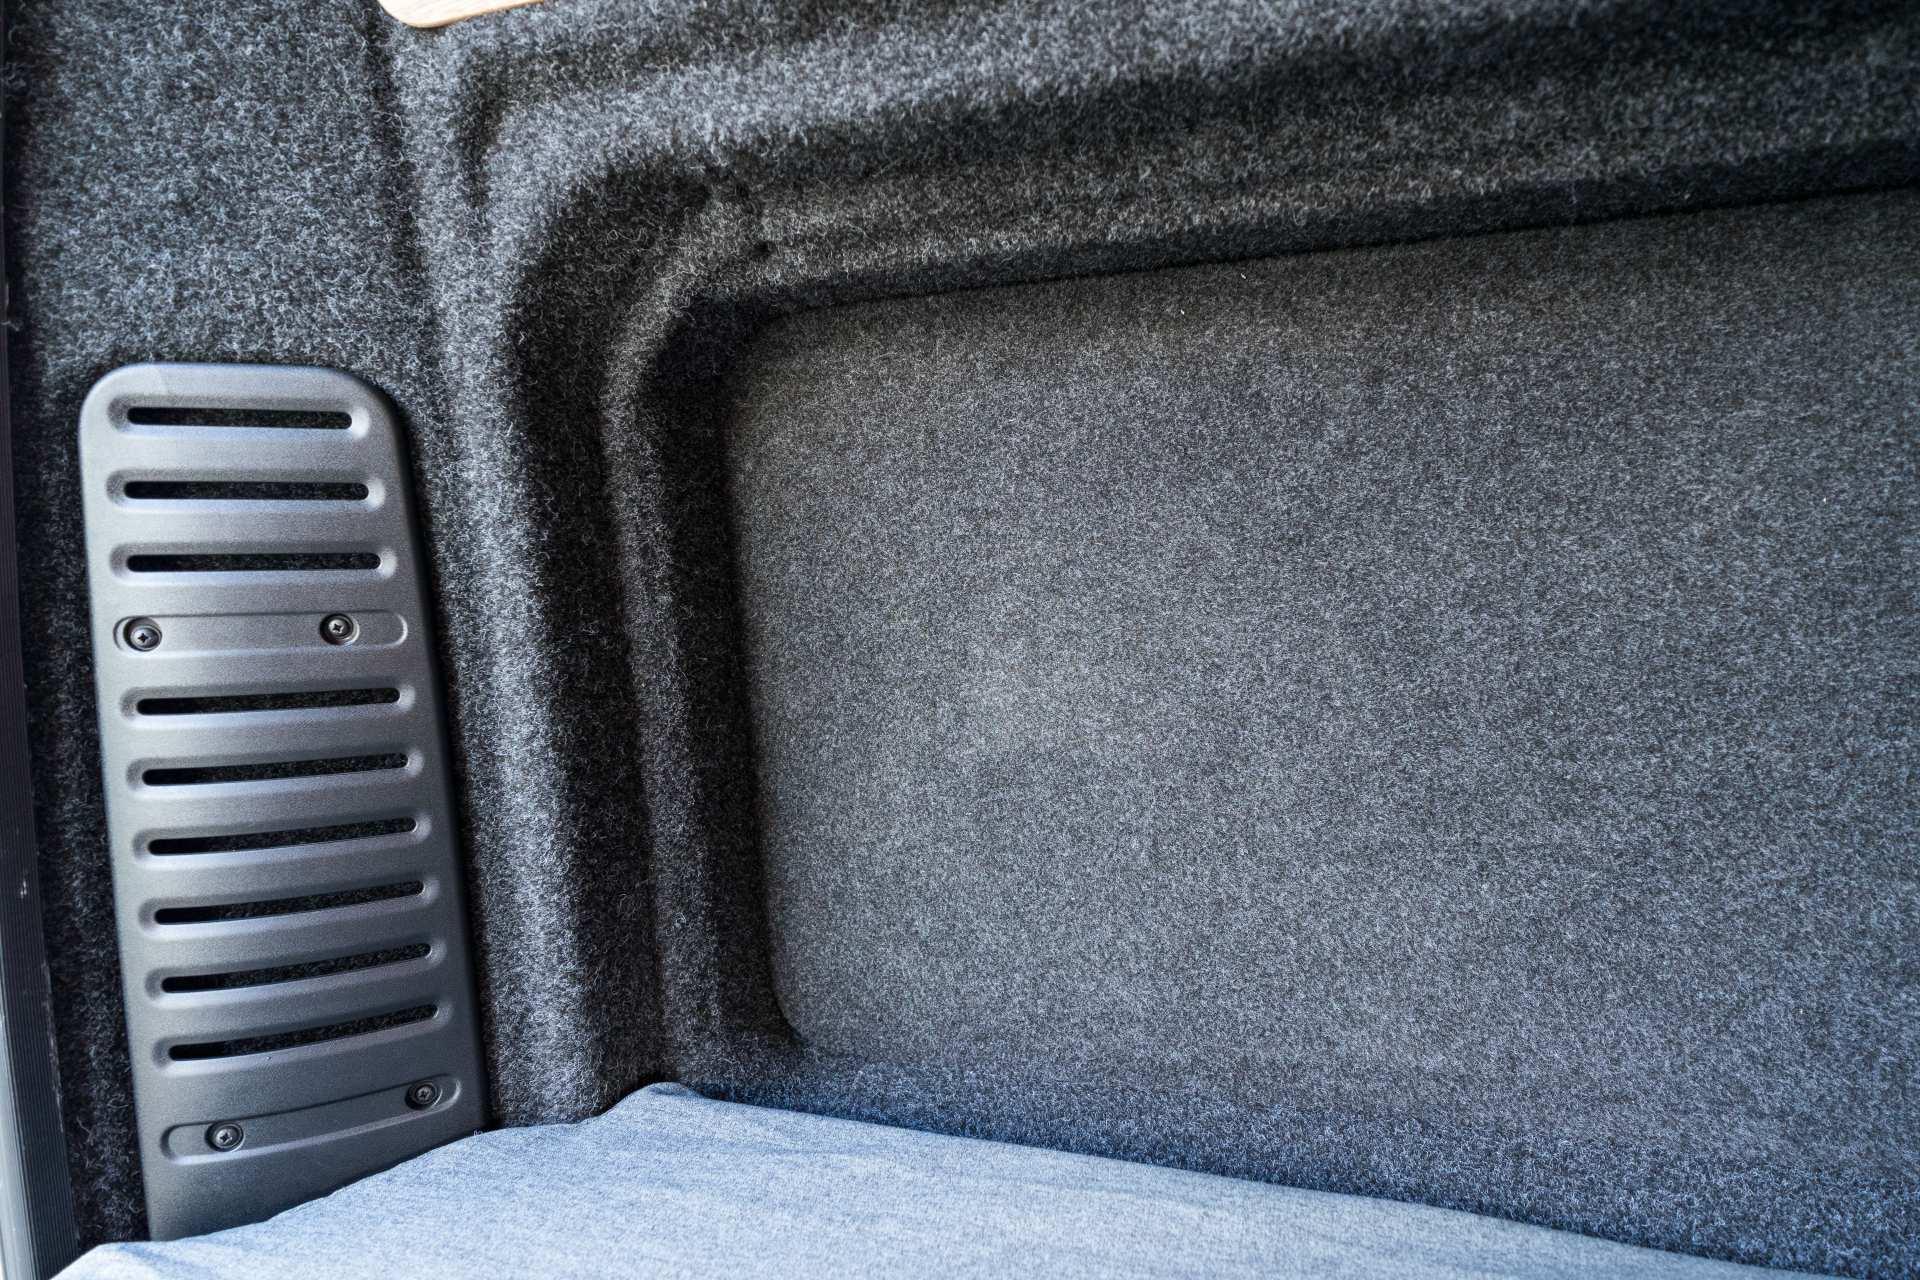 Individualausbau: Zwei-Raumwohnung Peugeot Boxer L2 H2 - 39